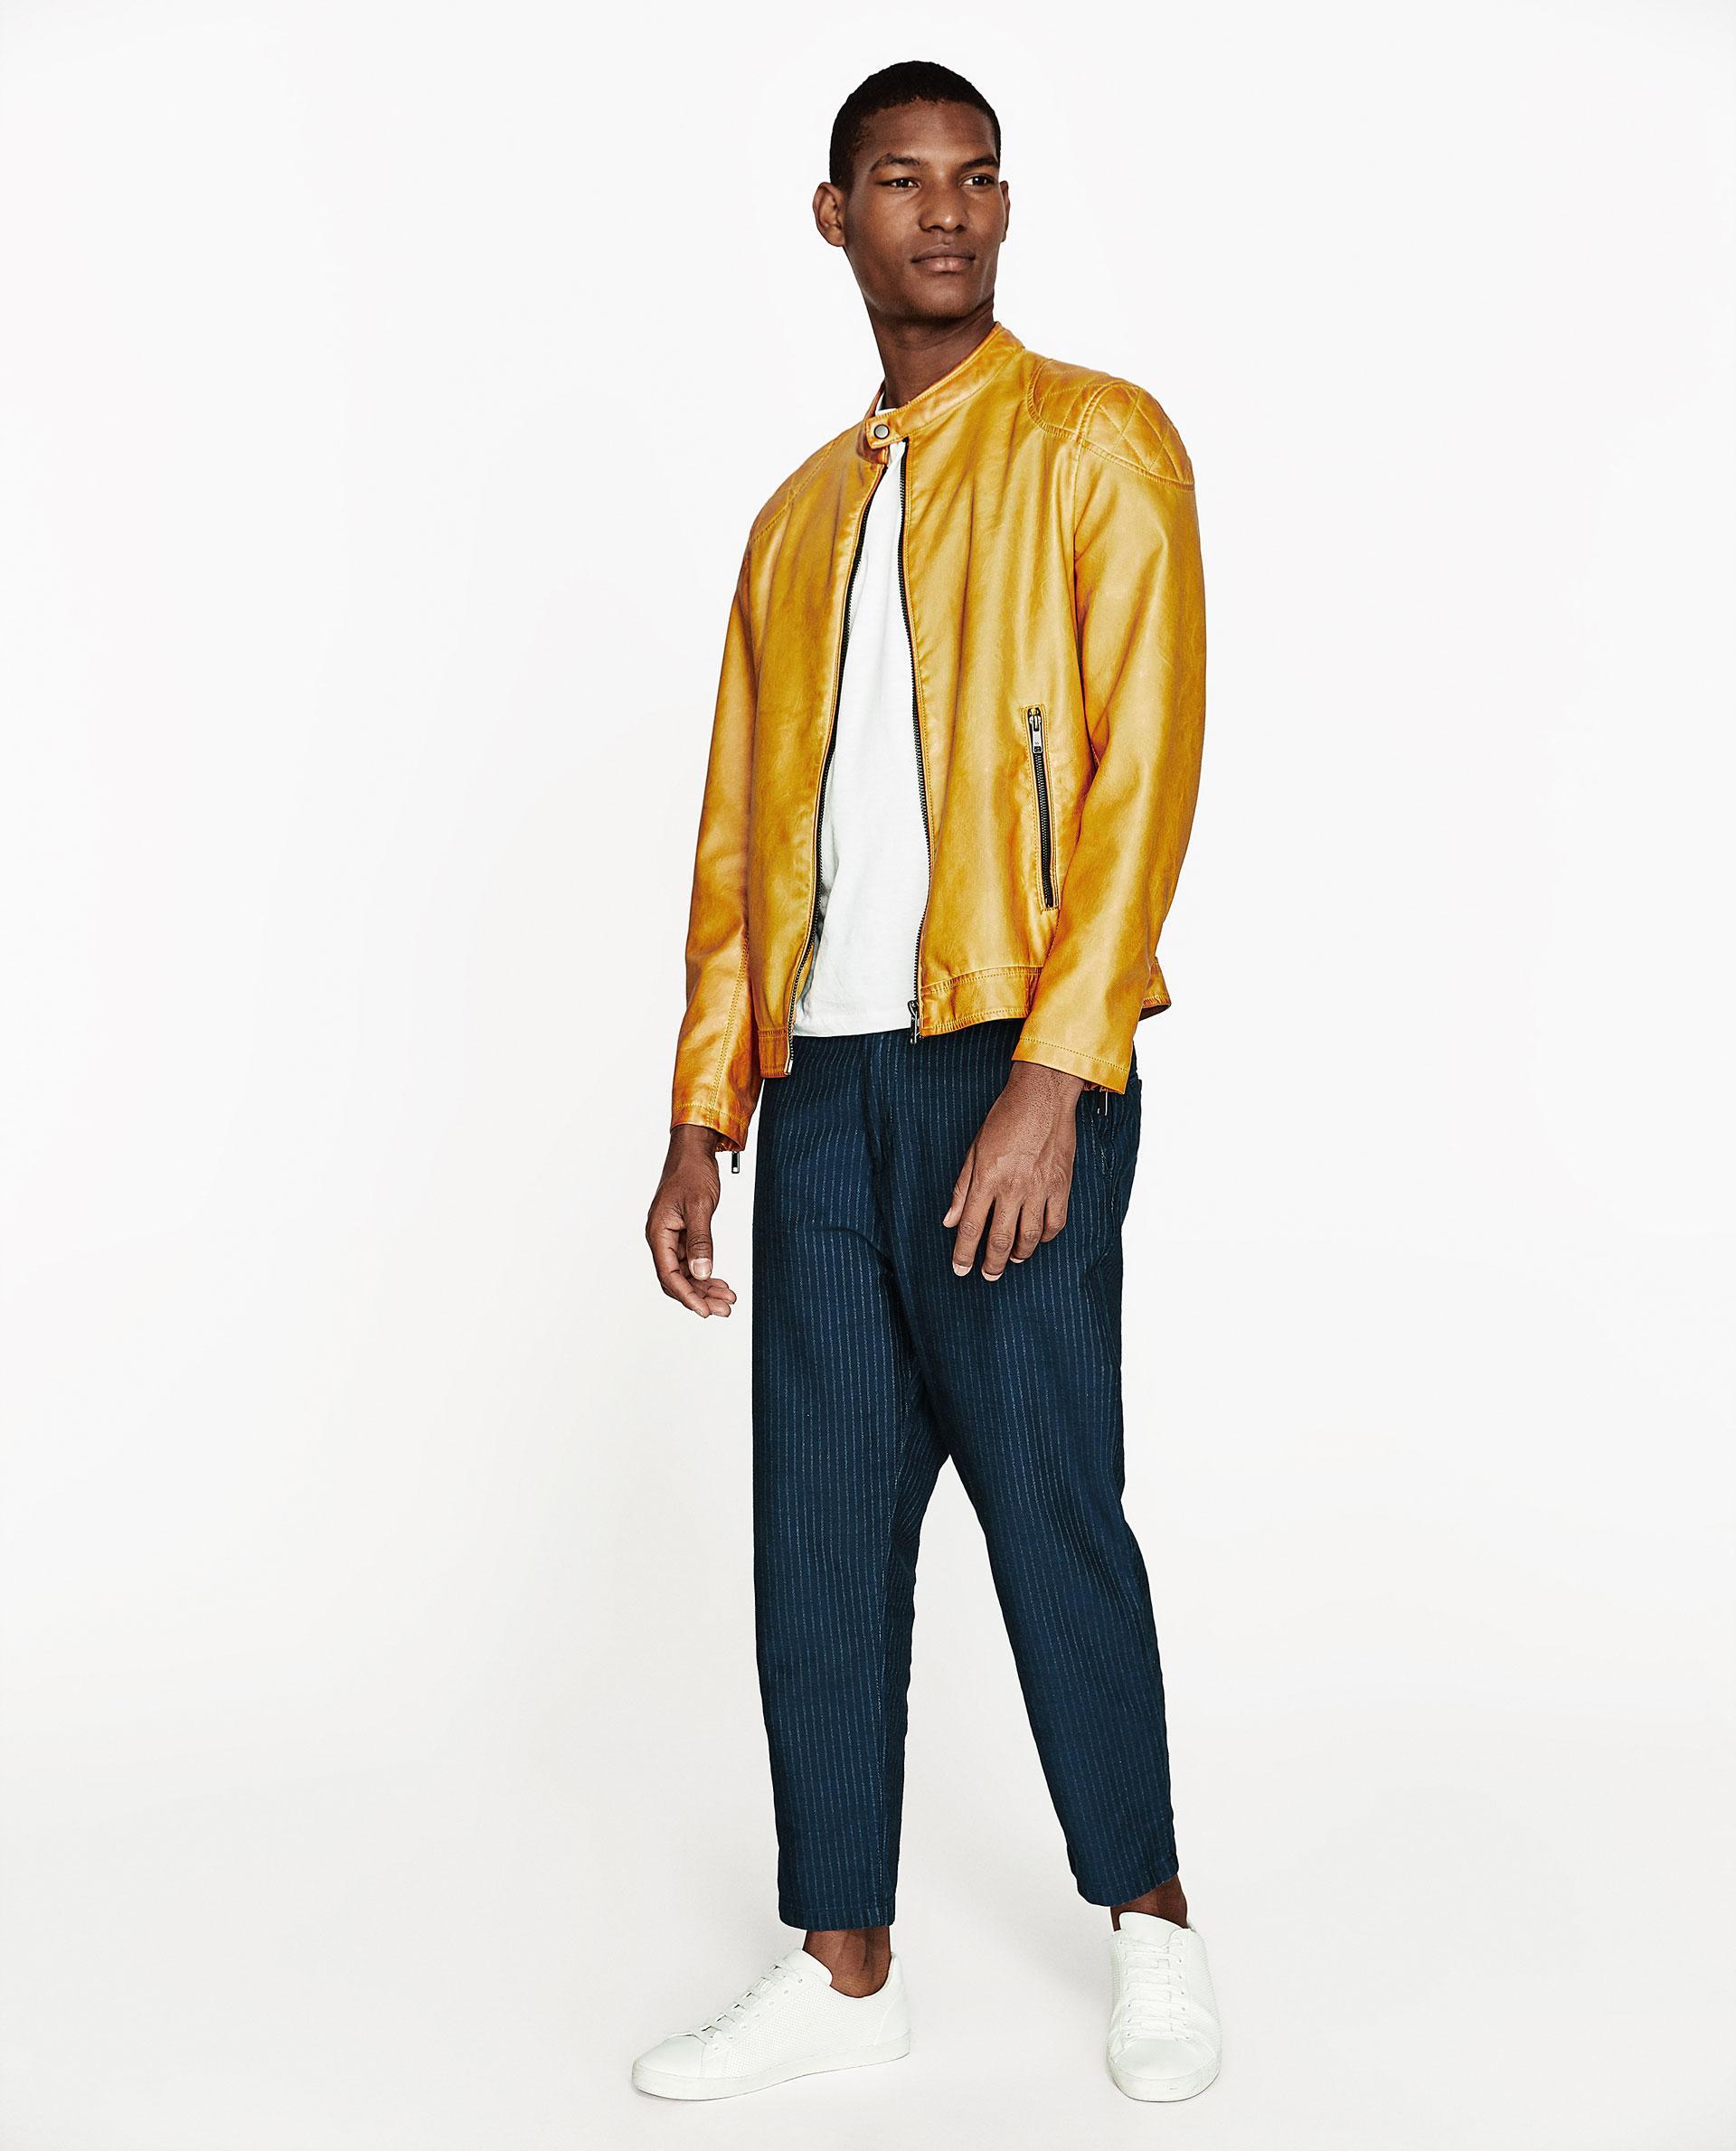 Leather jacket yellow zara - Zara Men S Yellow Faux Leather Jacket